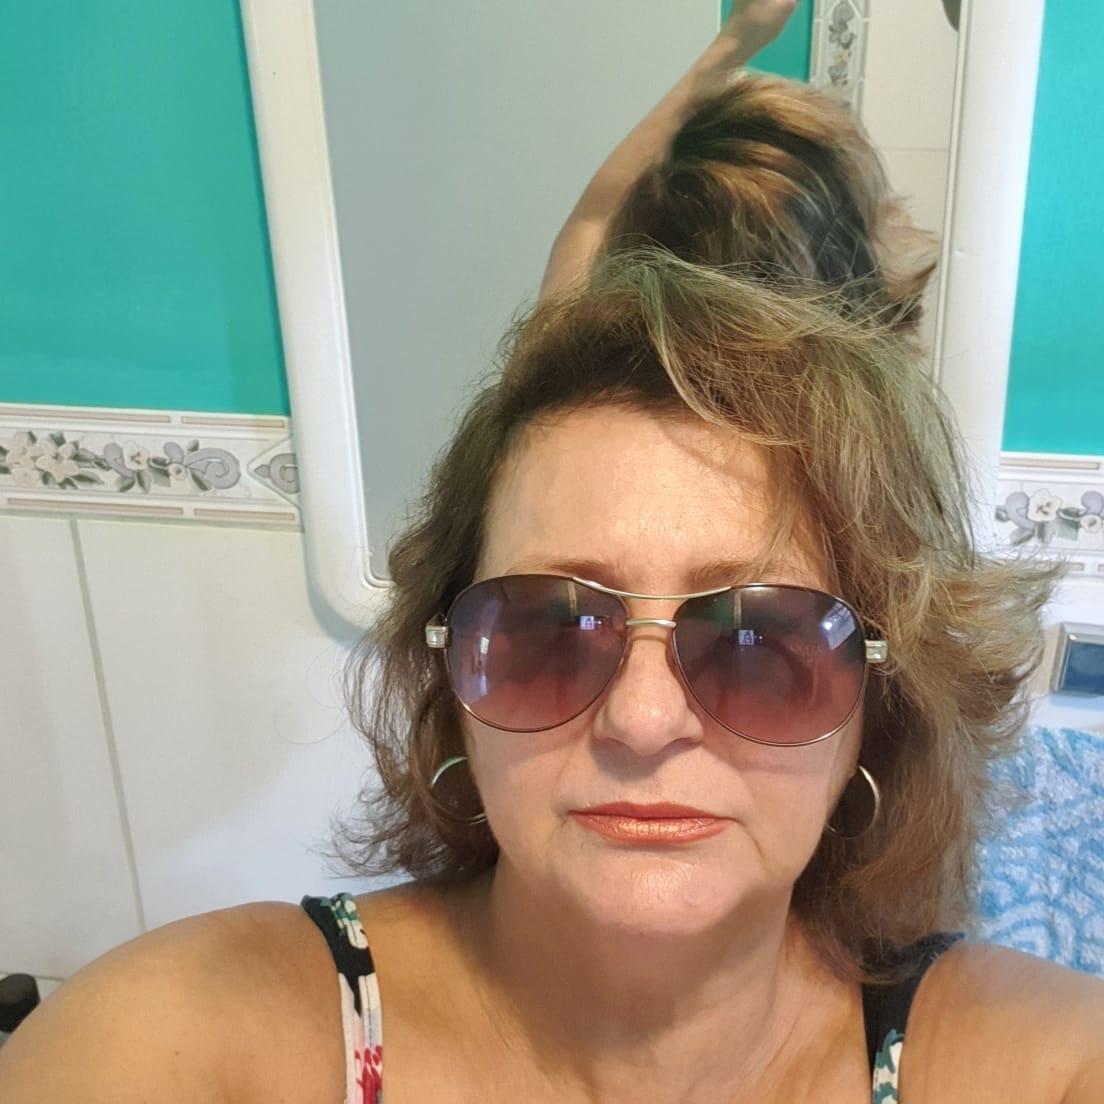 Ana Cristina, viúva de Laelio de Andrade